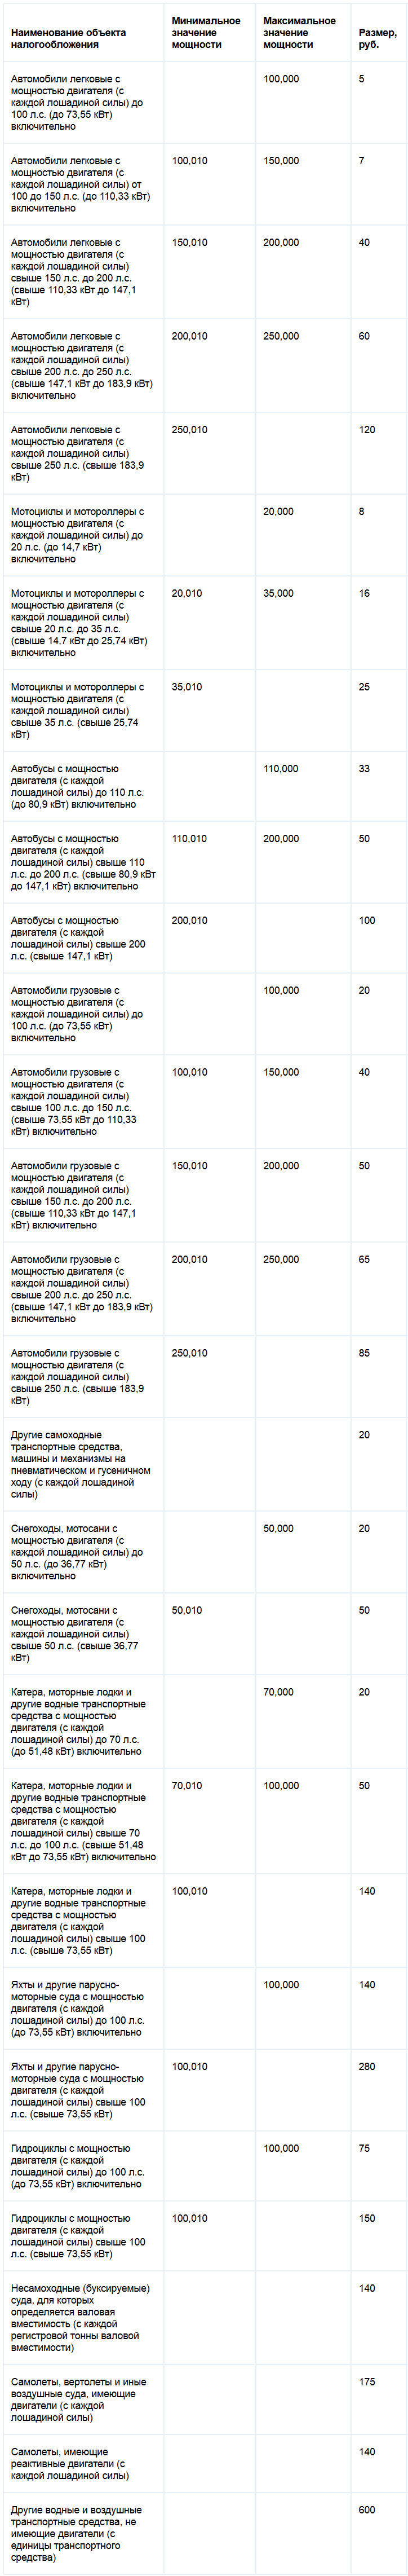 Ставки транспортного налога Ханты-Мансийского автономного округа